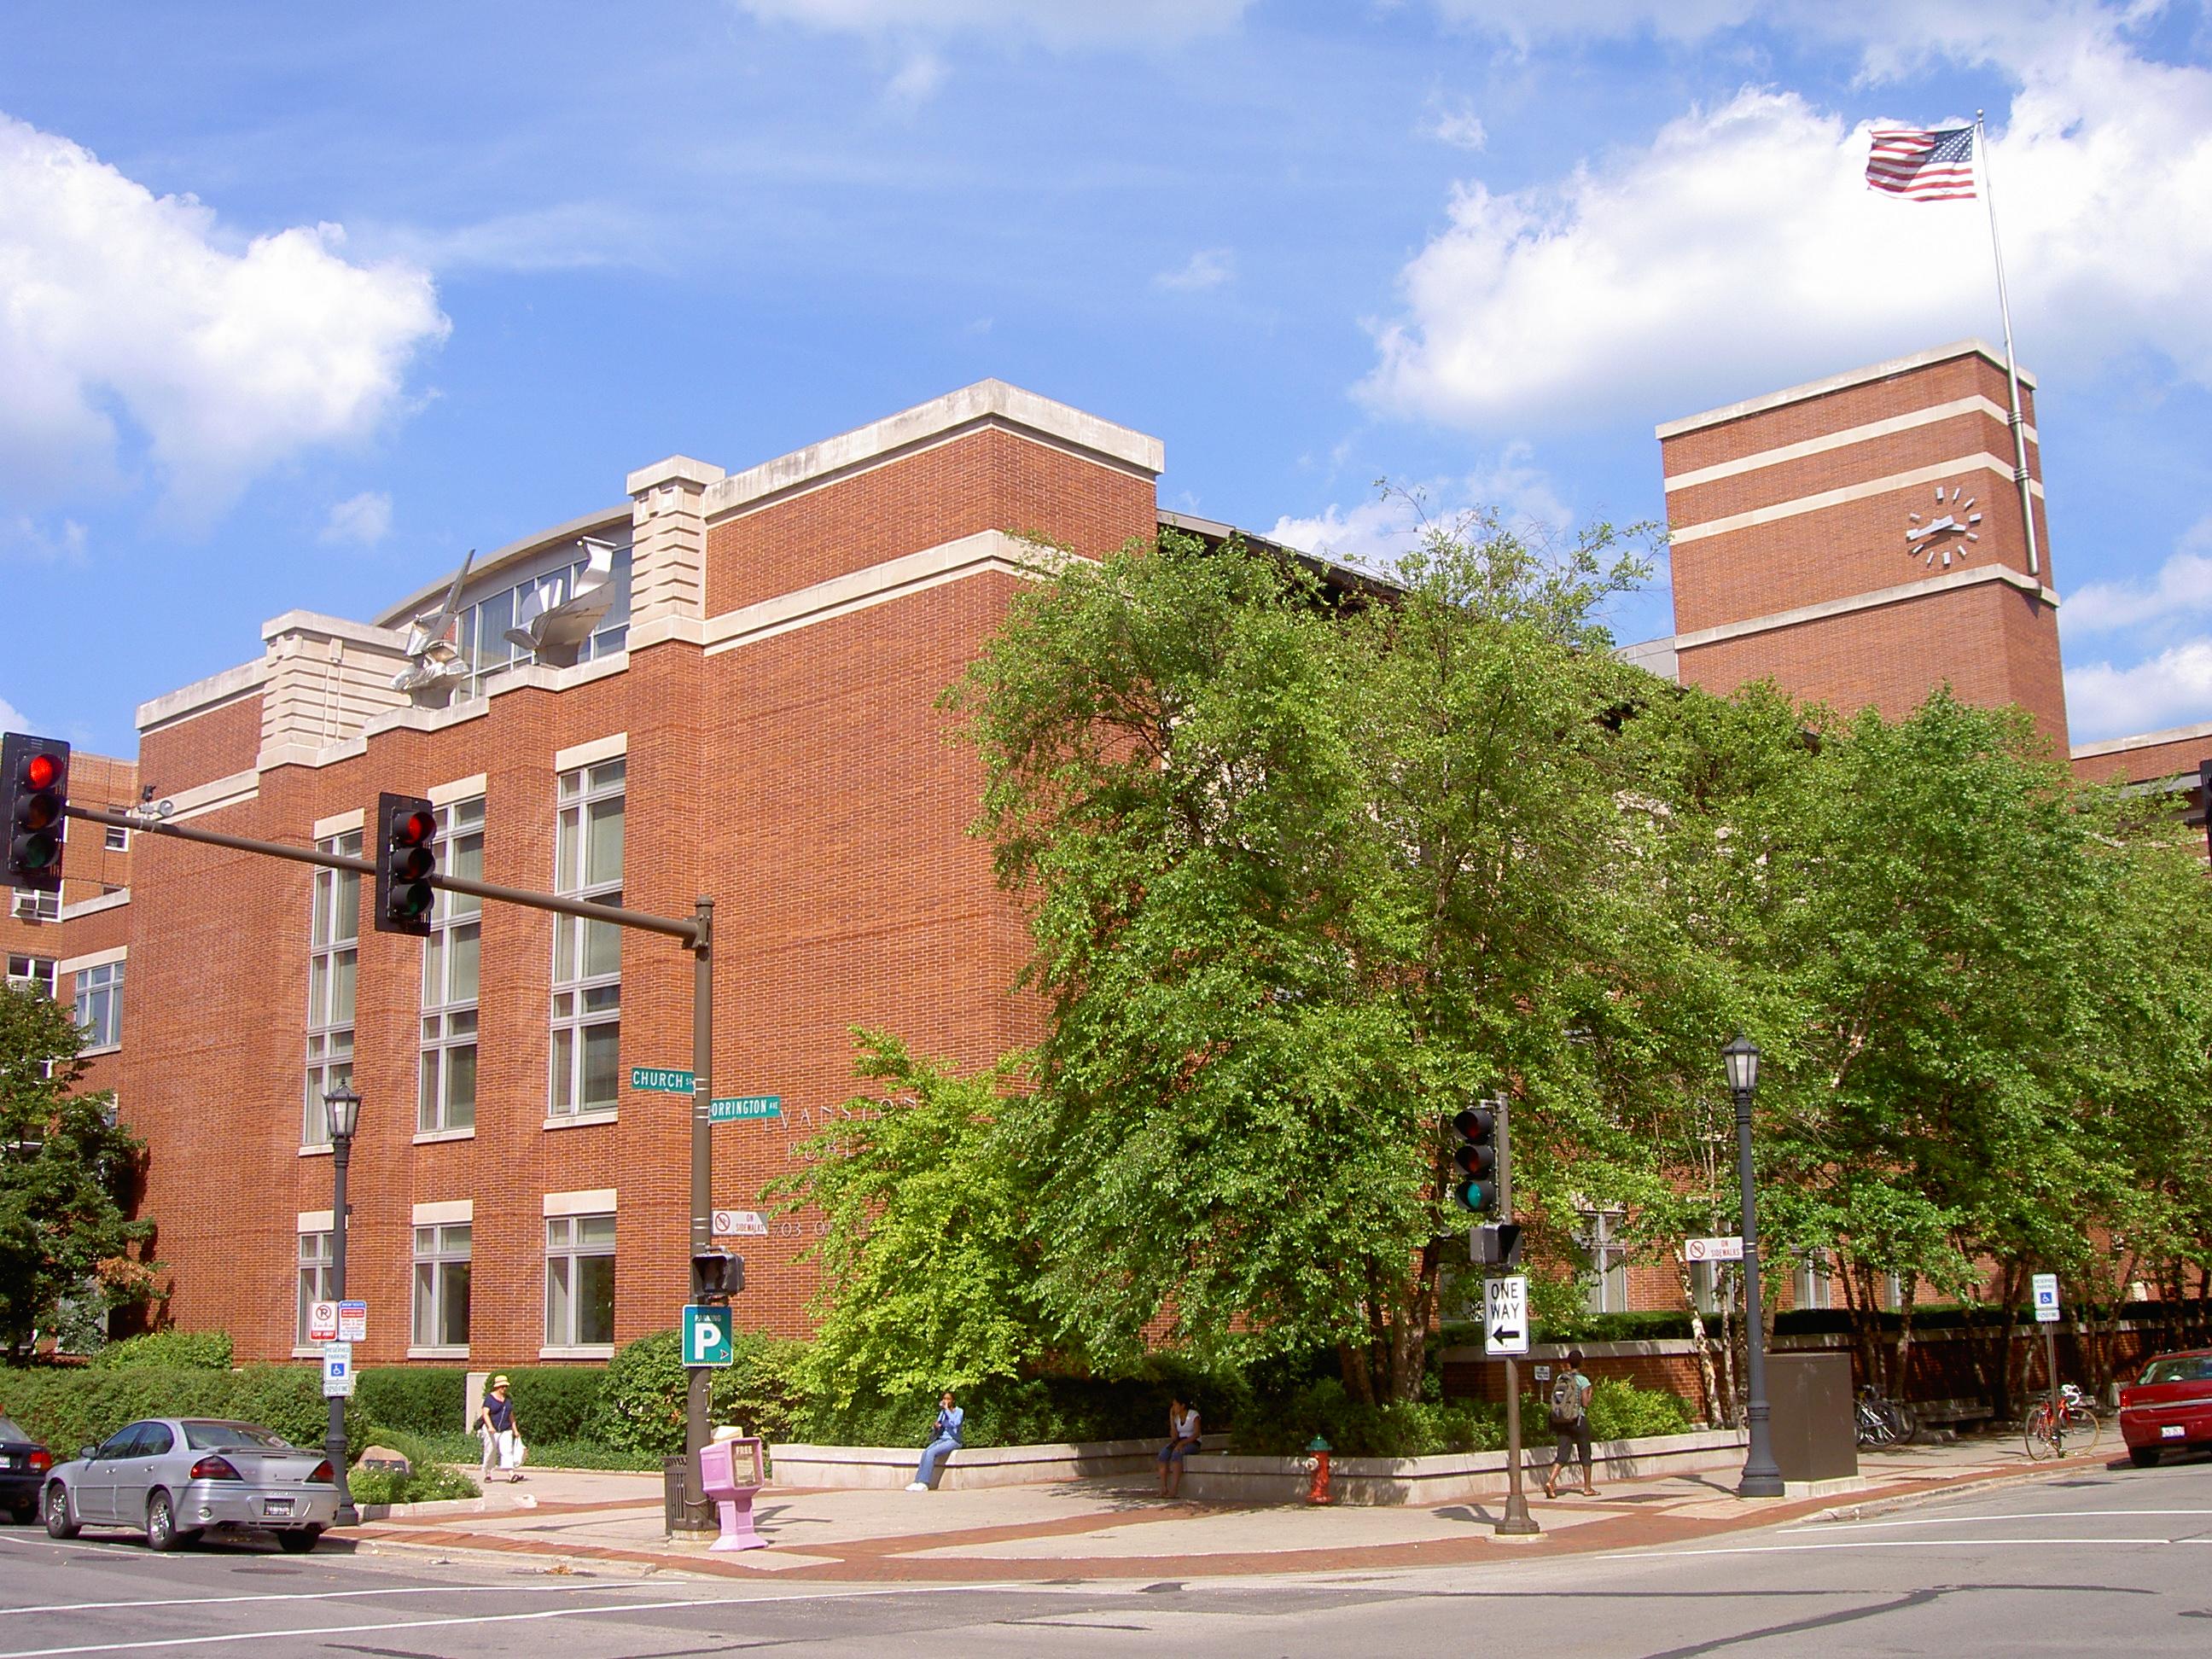 Evanston public library main branch